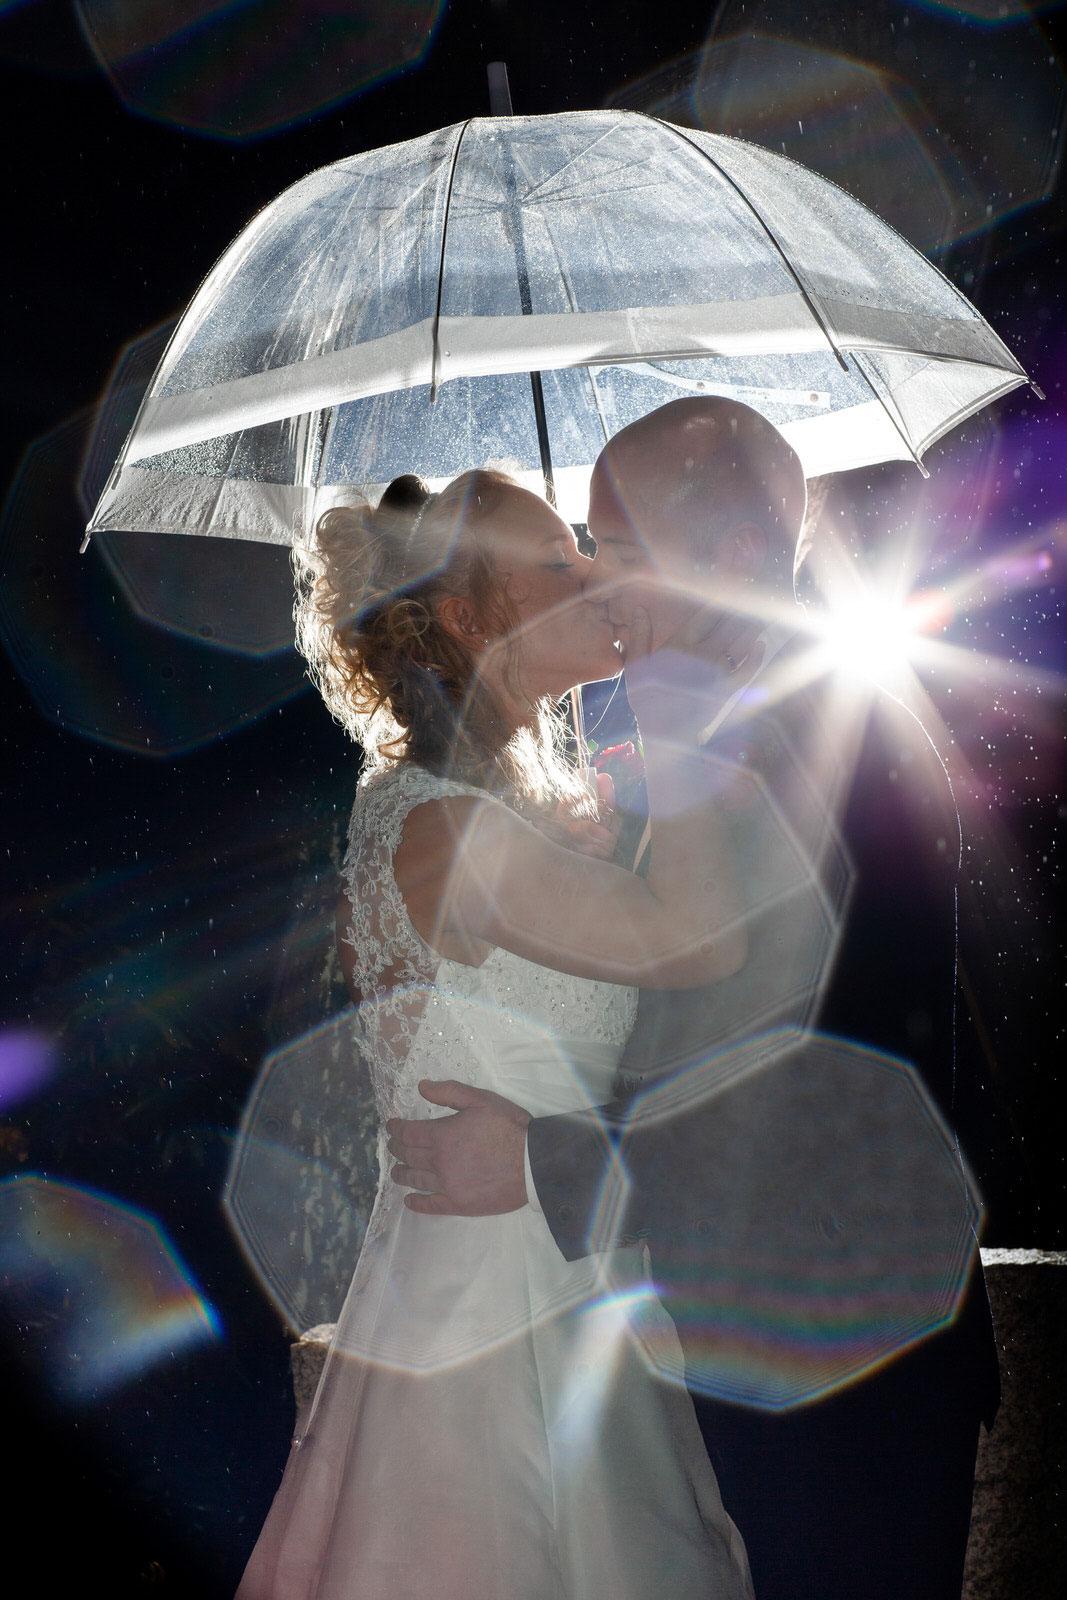 Hochzeit Bardowick, Gildehaus Bardowick, Grüne Stute Brietlingen, Jennifer & Fabian, Hochzeitsfotografien Birgit Fechner,FOTOFECHNER,Hochzeitsfotograf Lüneburg,Startbild